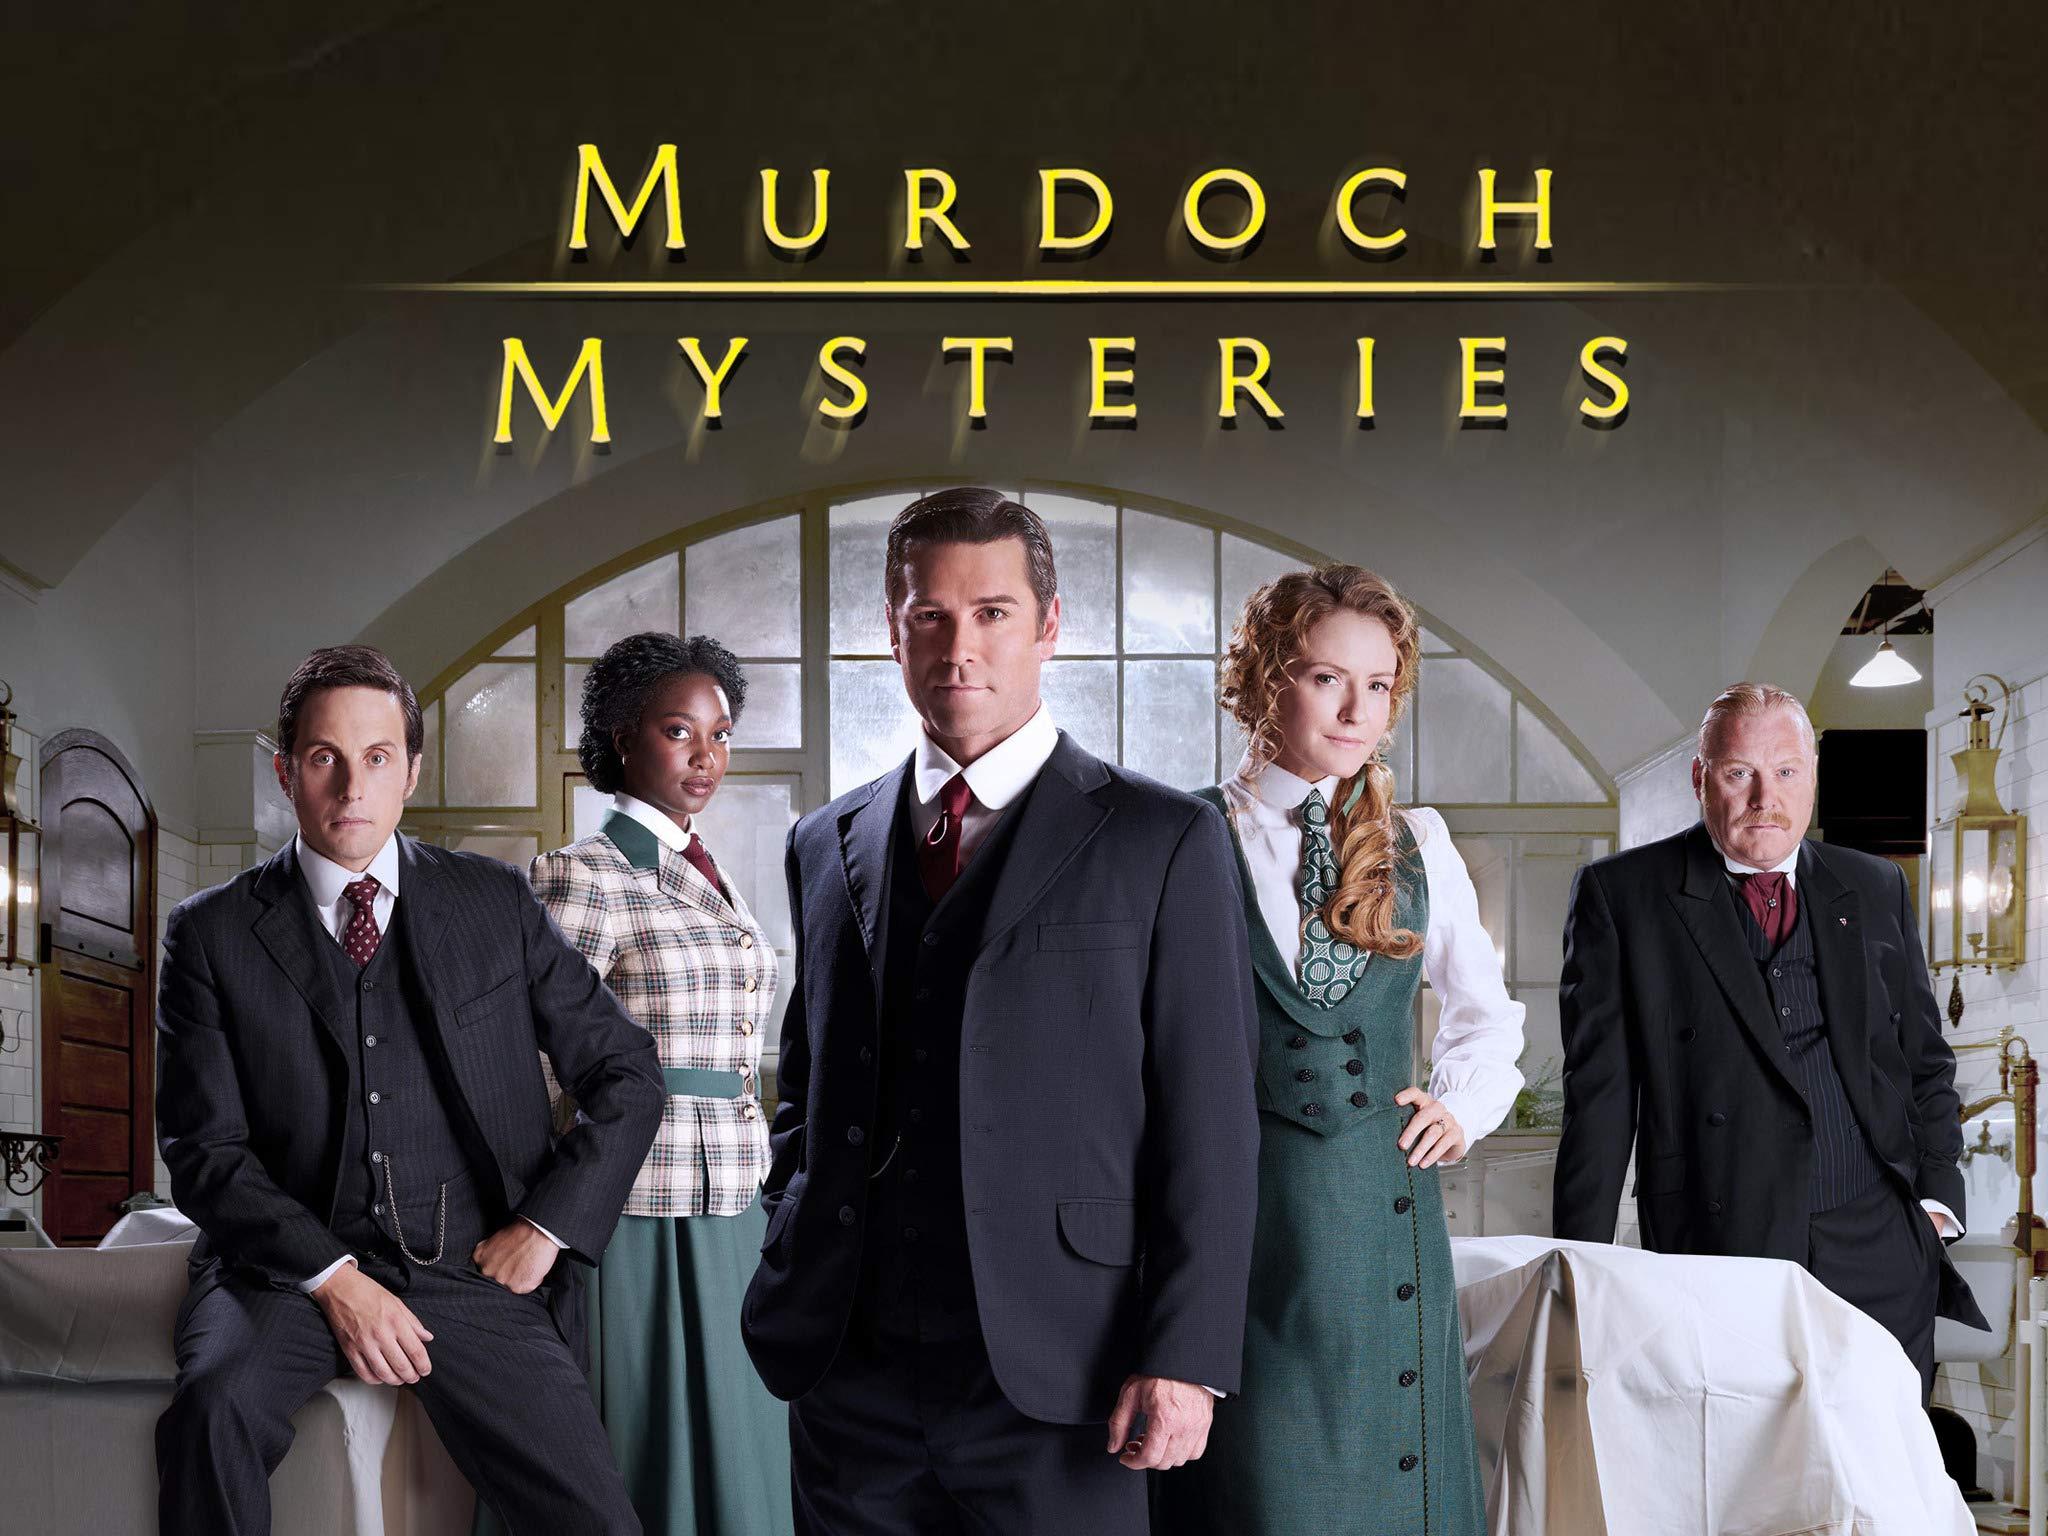 Murdoch Mysteries Christmas Special 2020 Watch Murdoch Mysteries Christmas Special | Prime Video